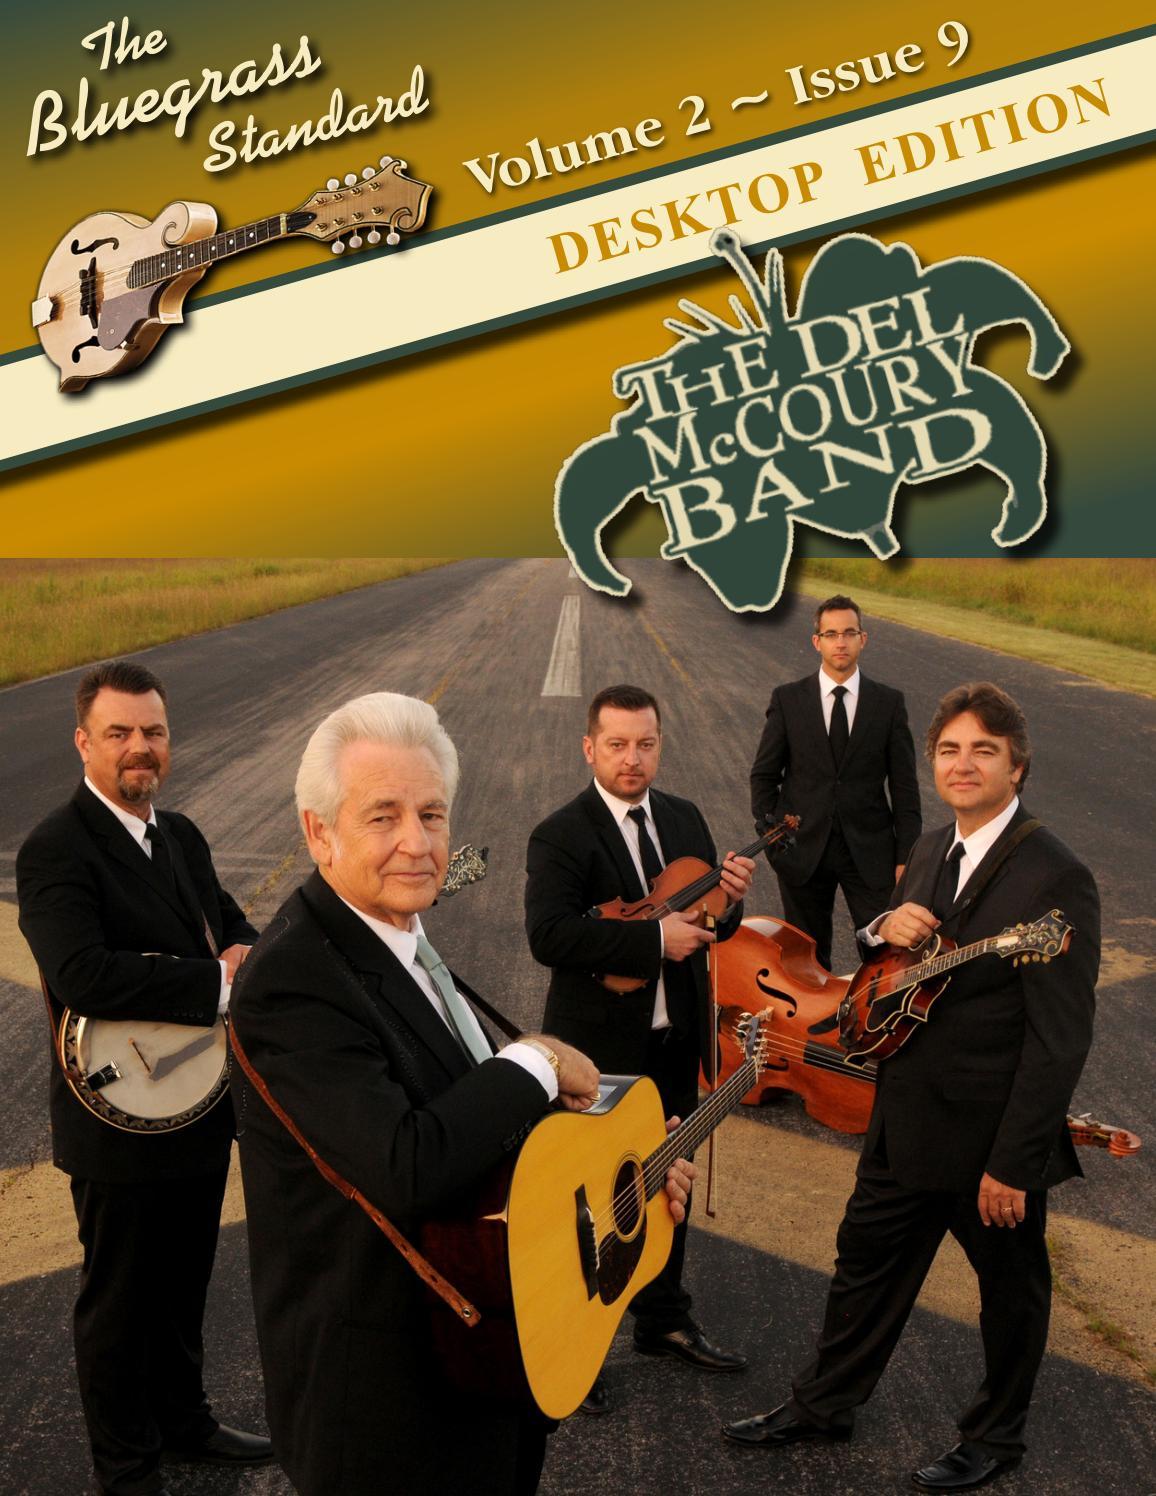 The Bluegrass Standard - Desktop - Volume 2, Issue 9 by The